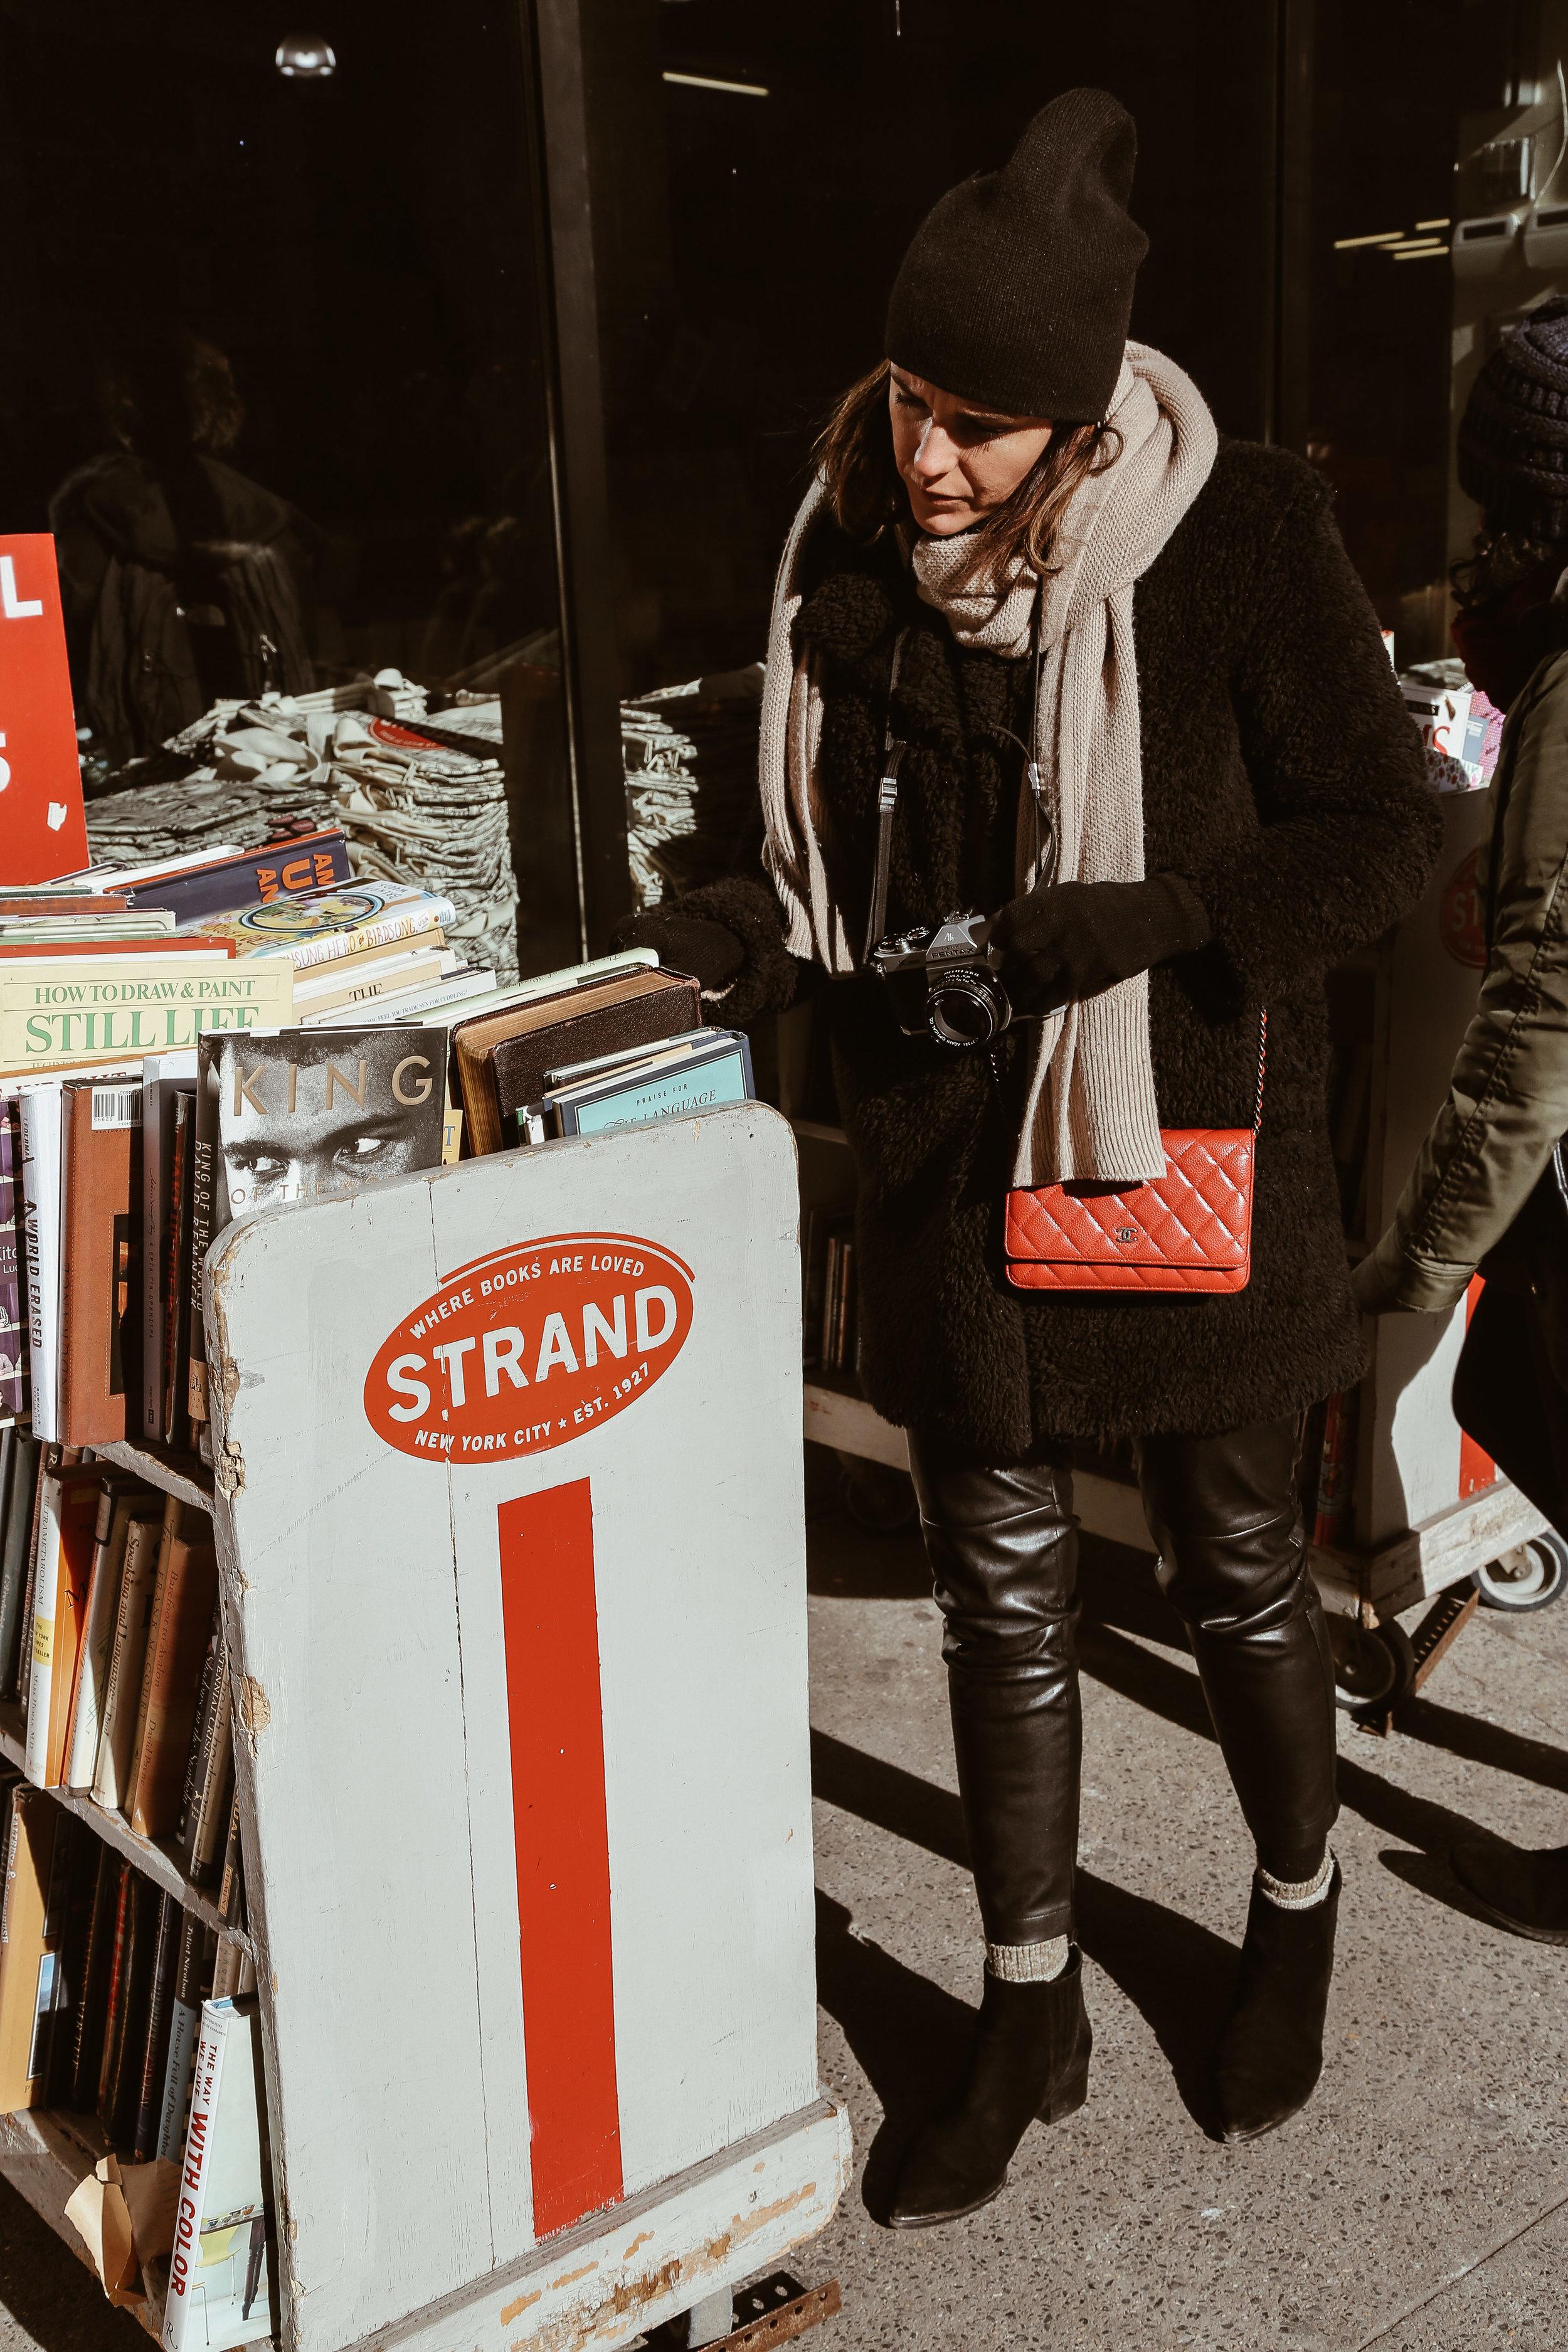 strand bookstore-1.jpg